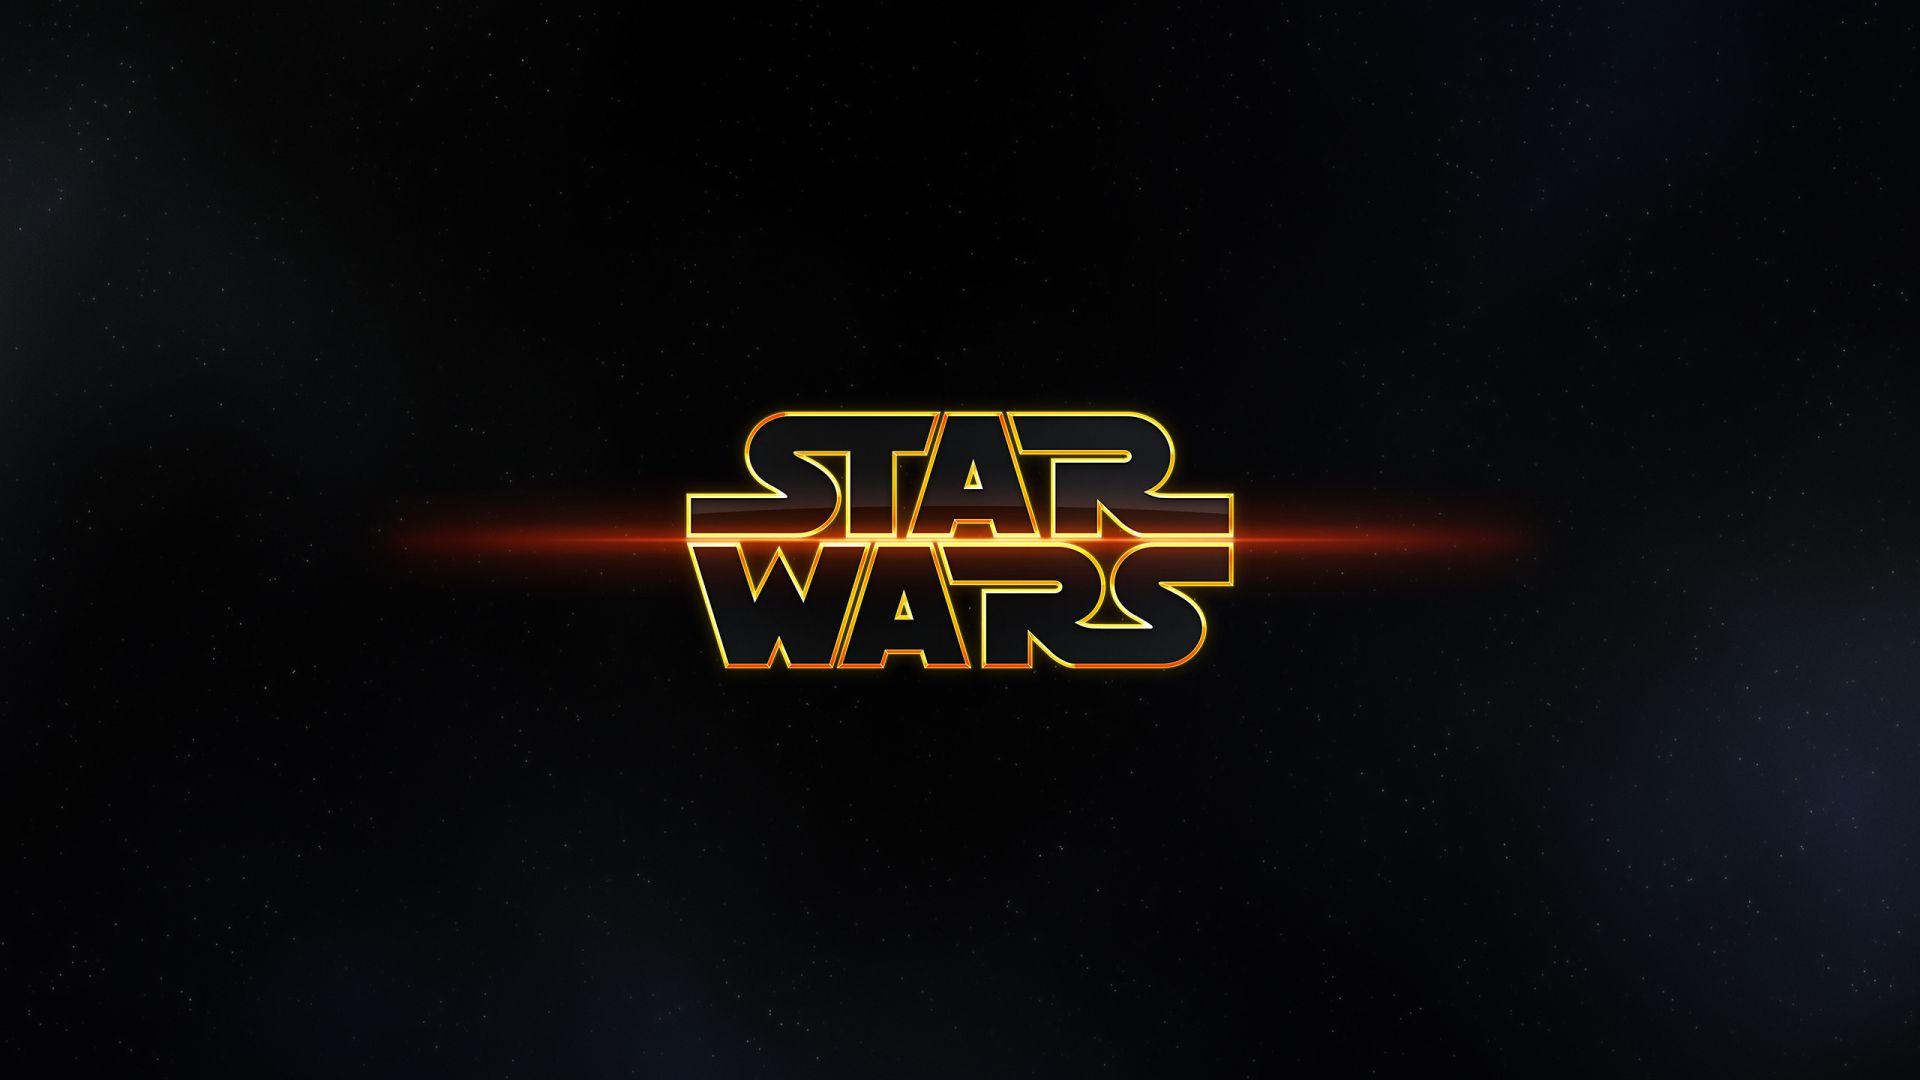 Star Wars Screensaver download free wallpaper image search